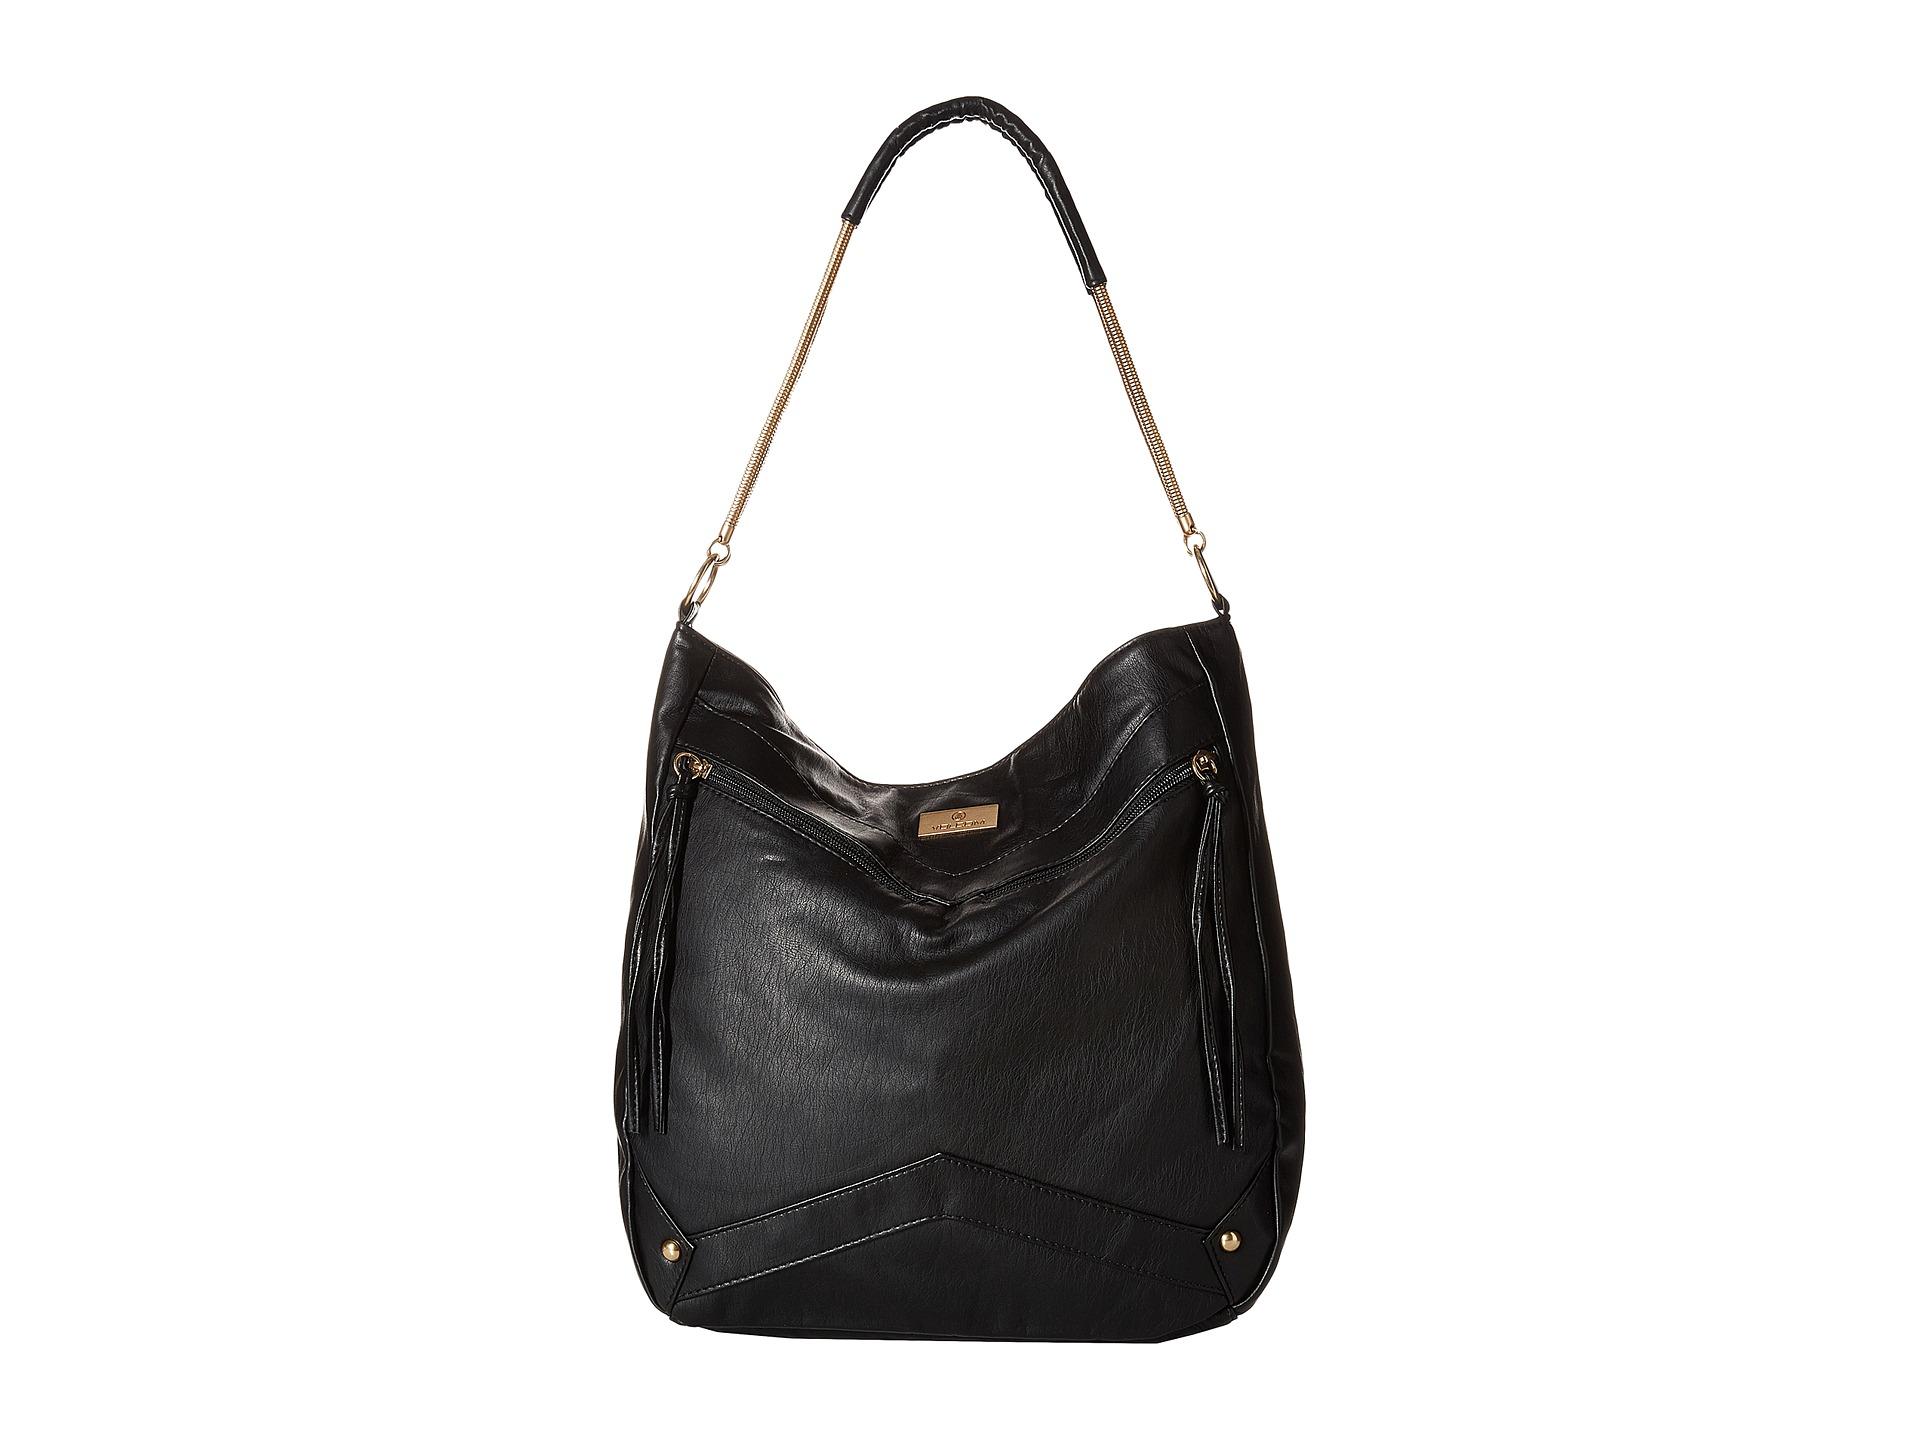 335409c5584 Volcom Zena Shoulder Bag in Black - Lyst